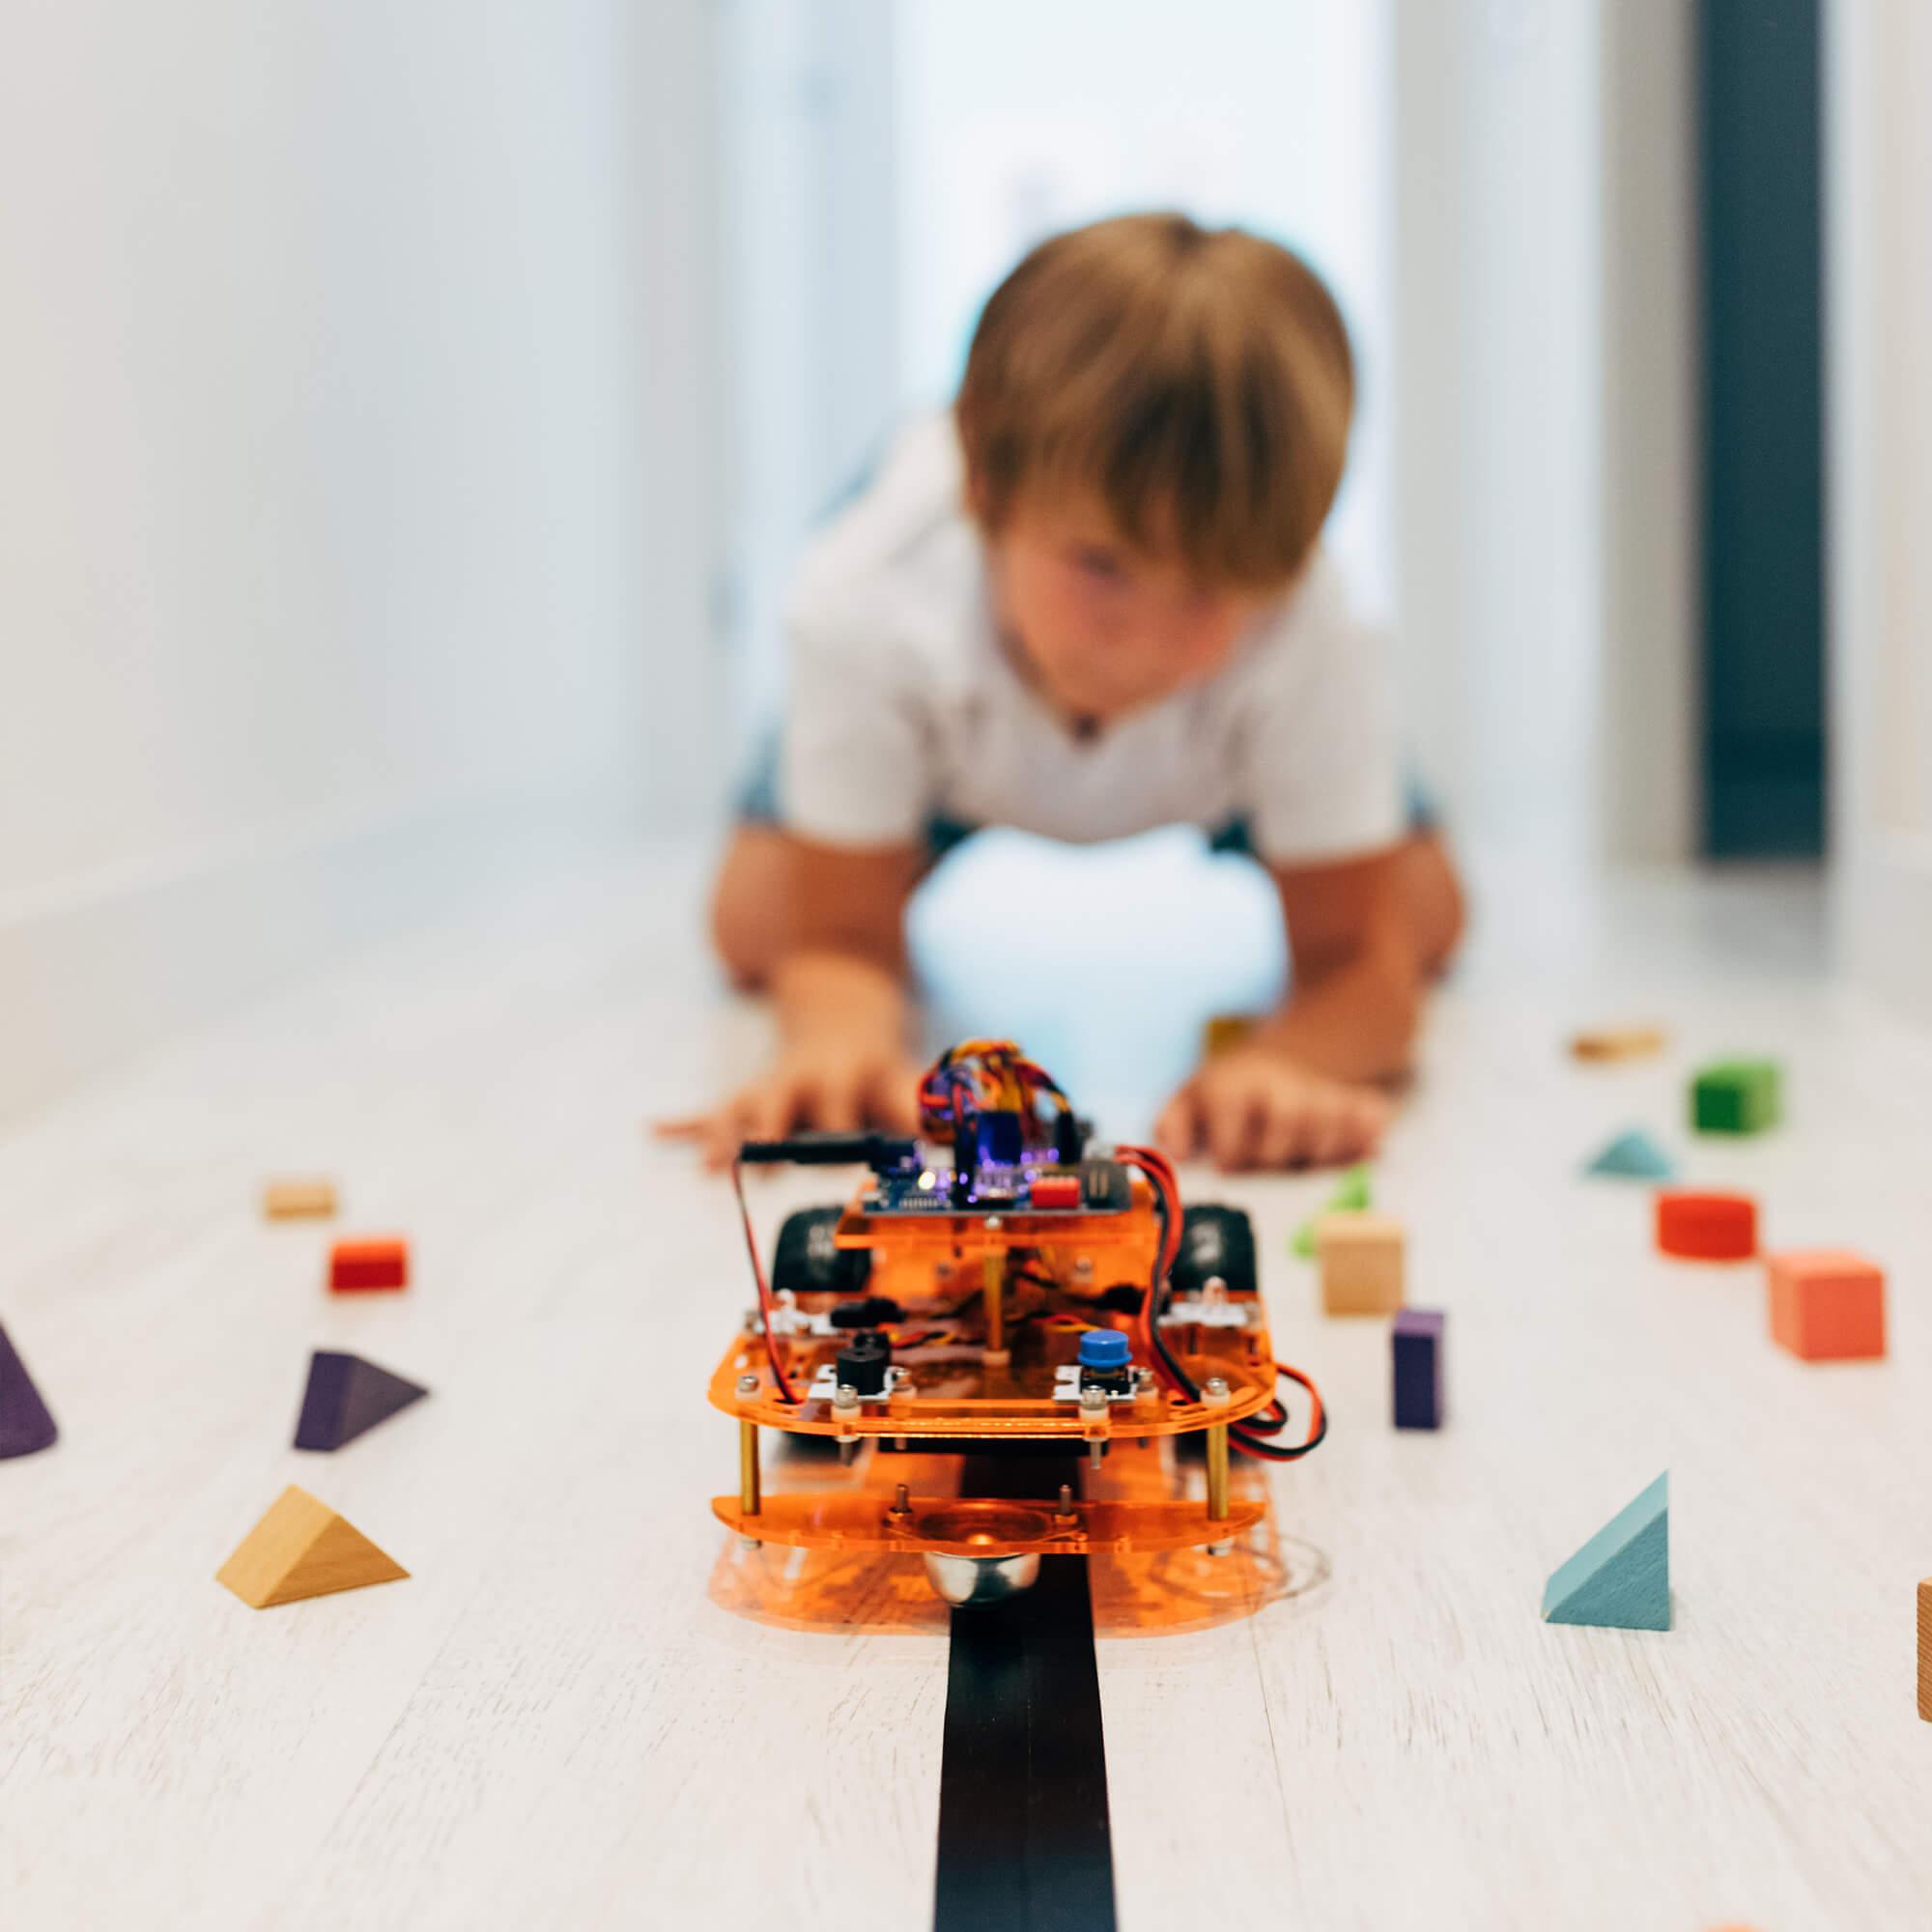 voiture robot ebotics code and drive